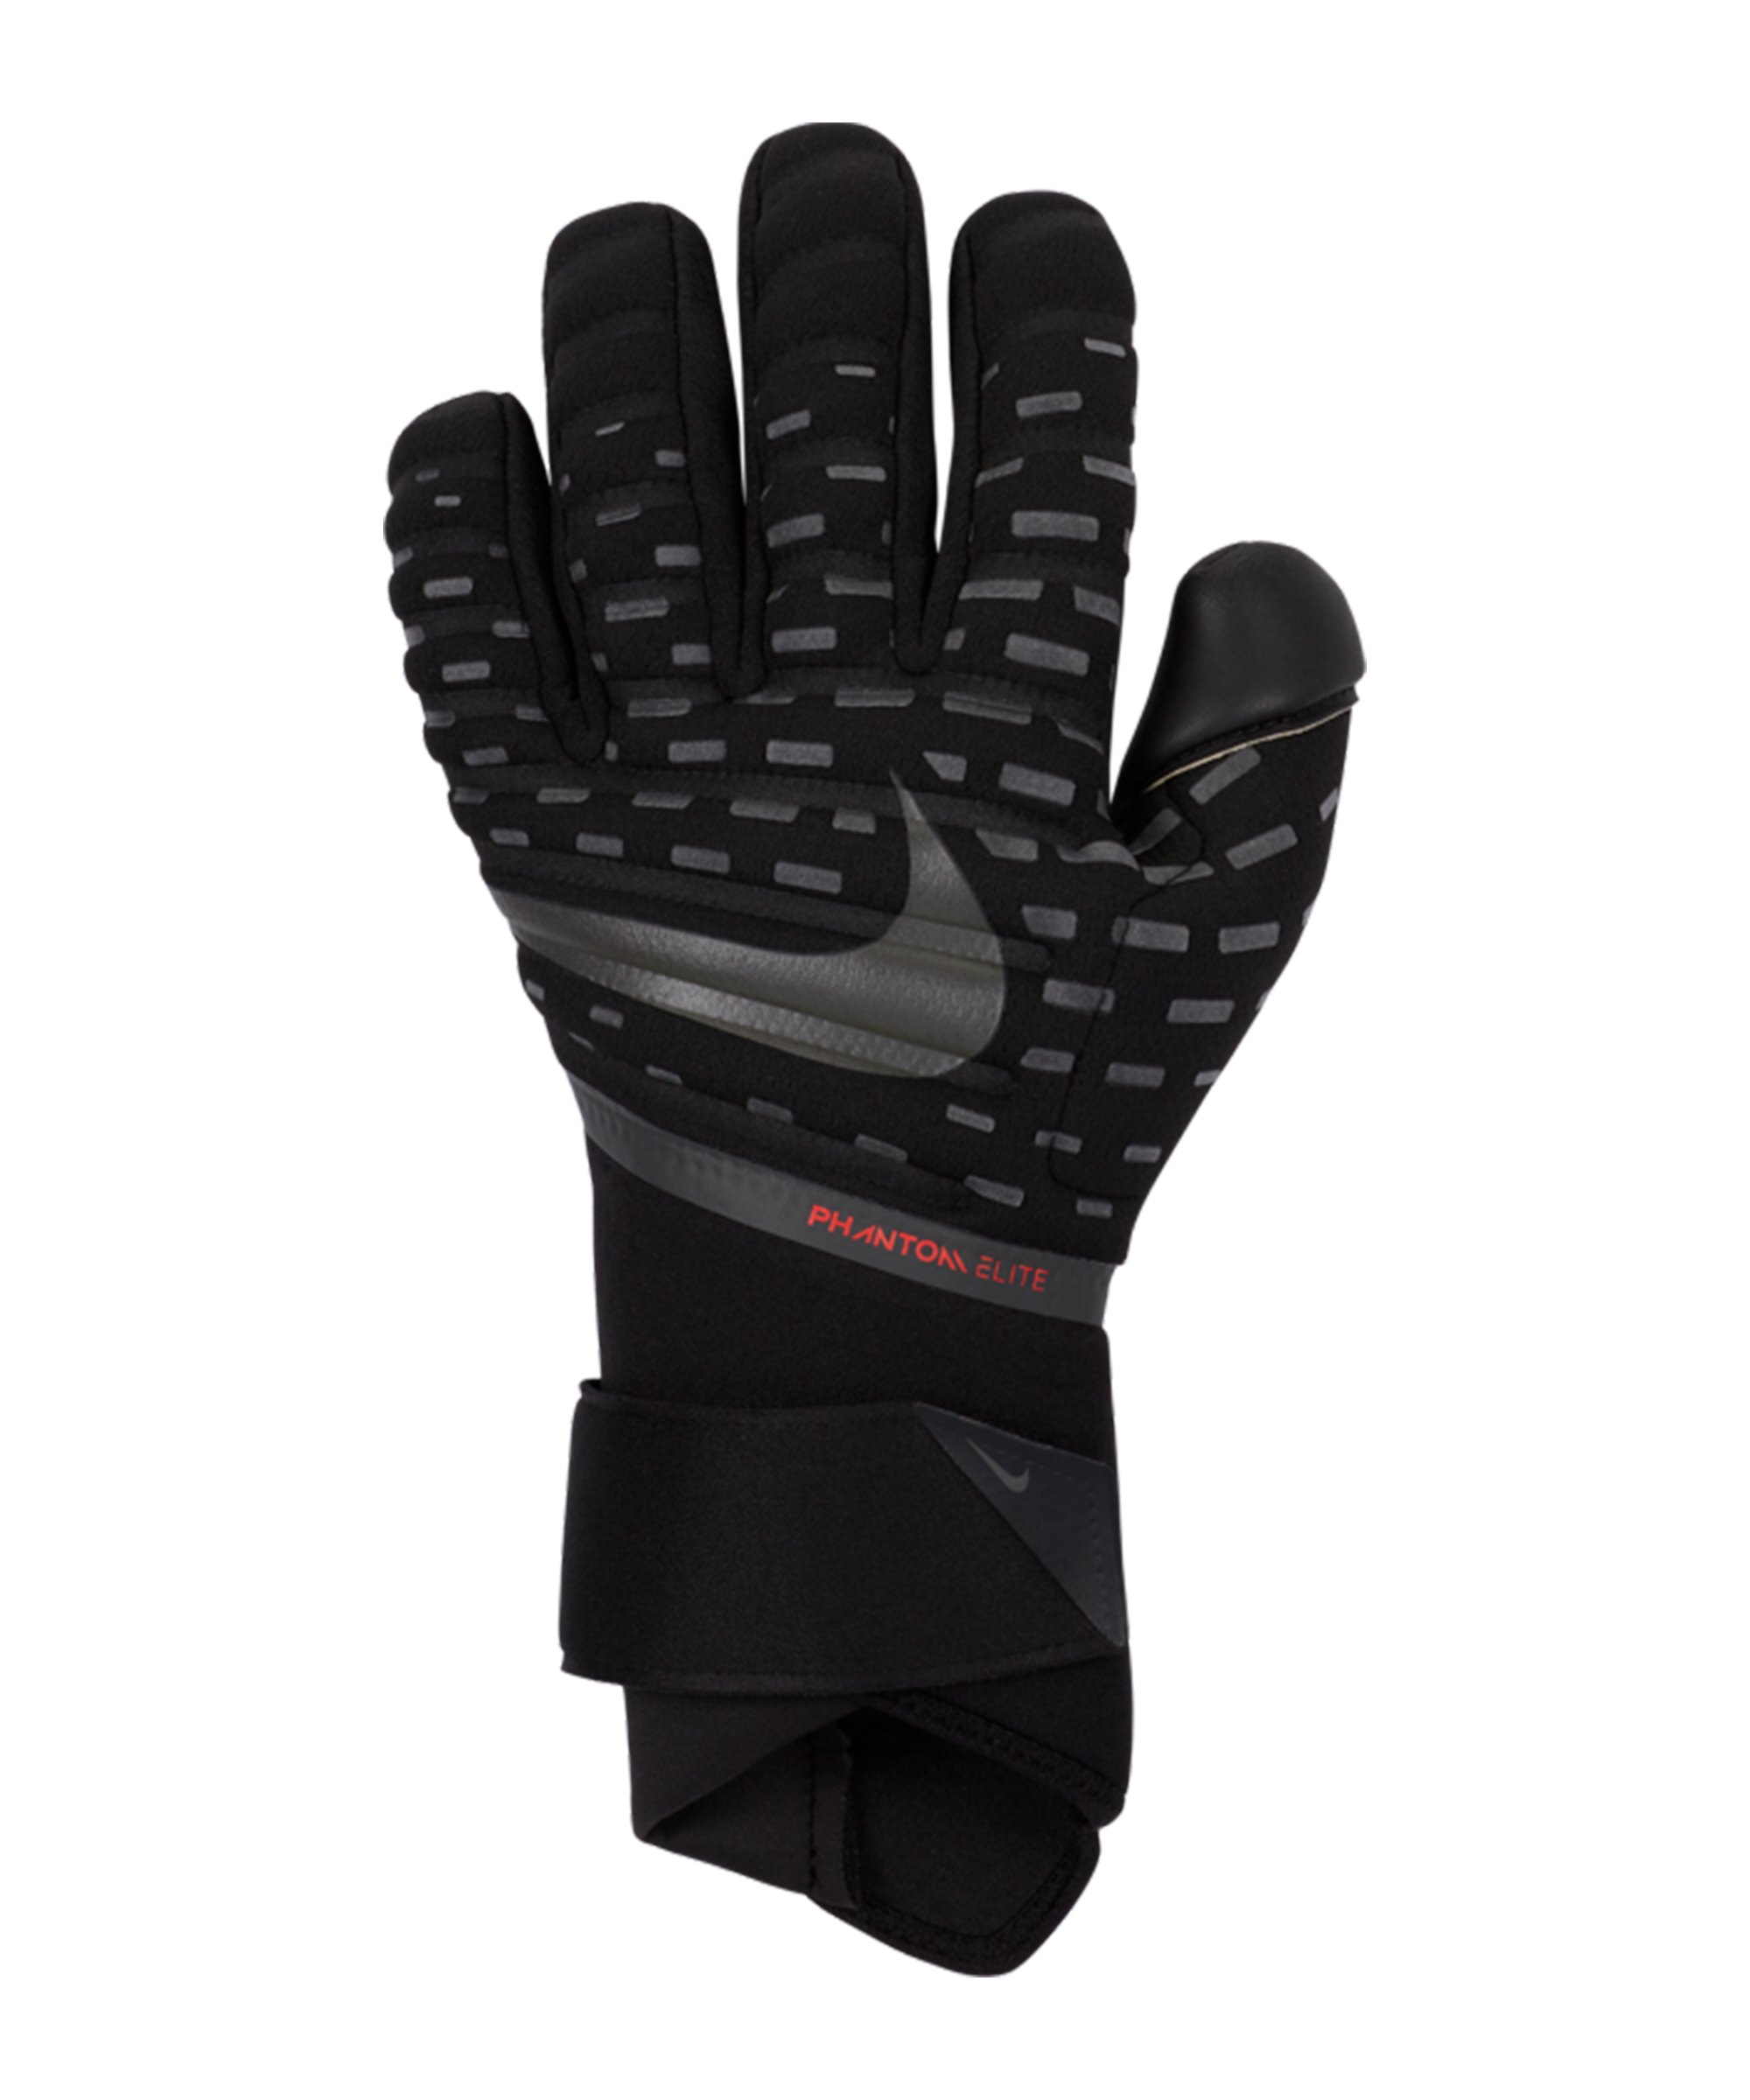 Nike Phantom Elite Black X Chile Torwarthandschuh Schwarz F013 - schwarz